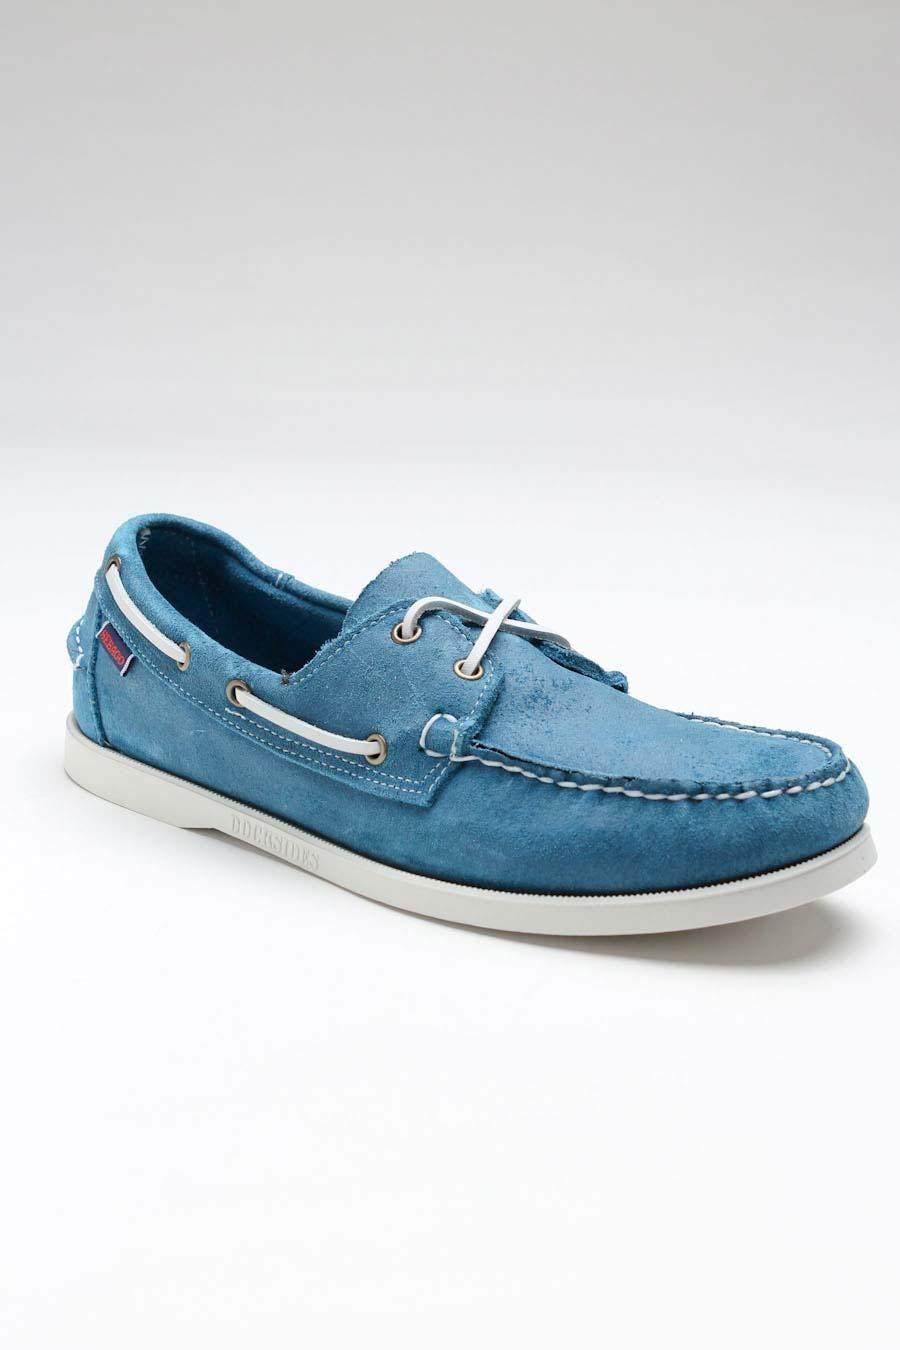 Sebago Docksides Shoe Clarks Shoes Women Shoes Women